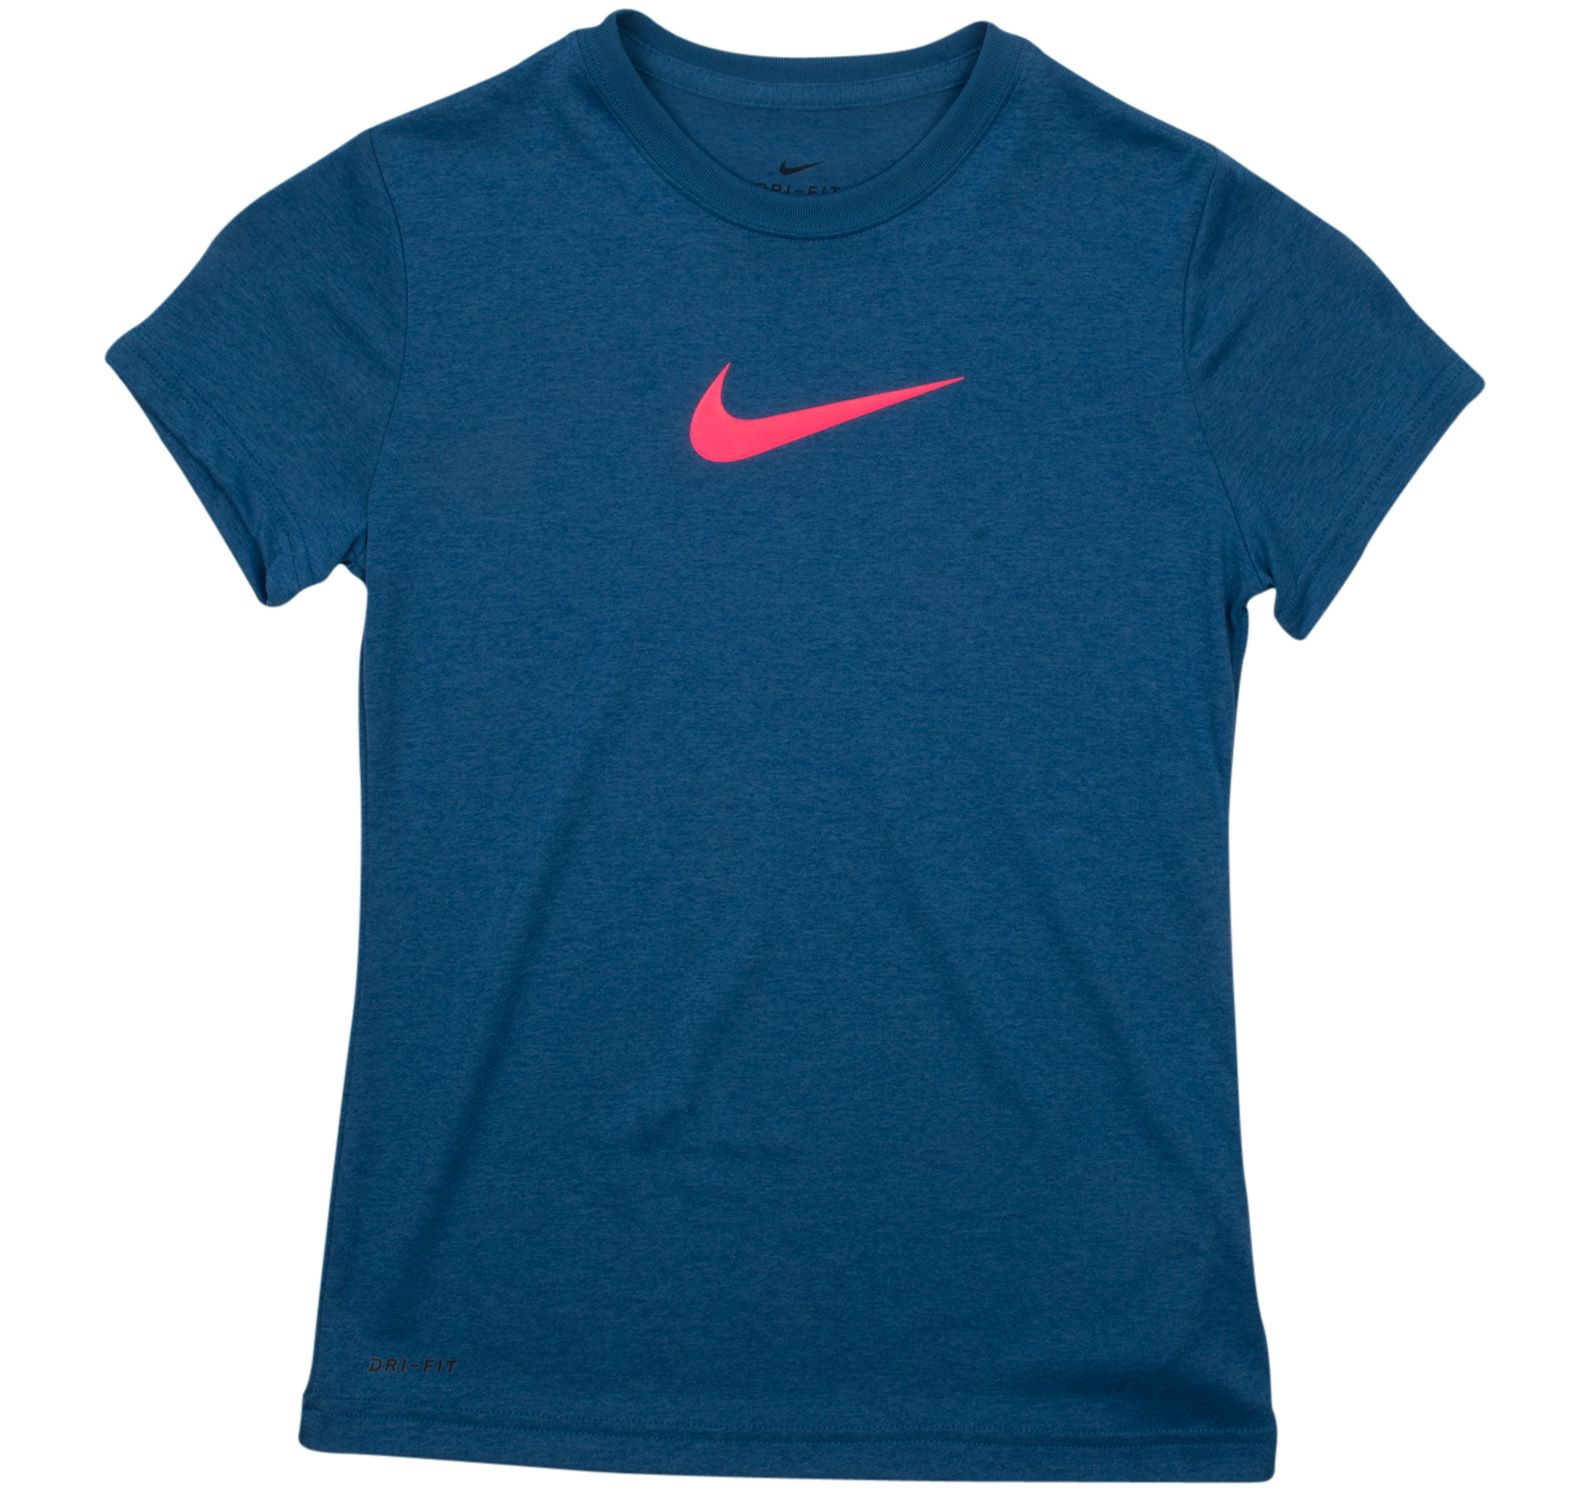 Legend Ss Top Yth, Industrial Blue/Racer Pink, L,  Nike